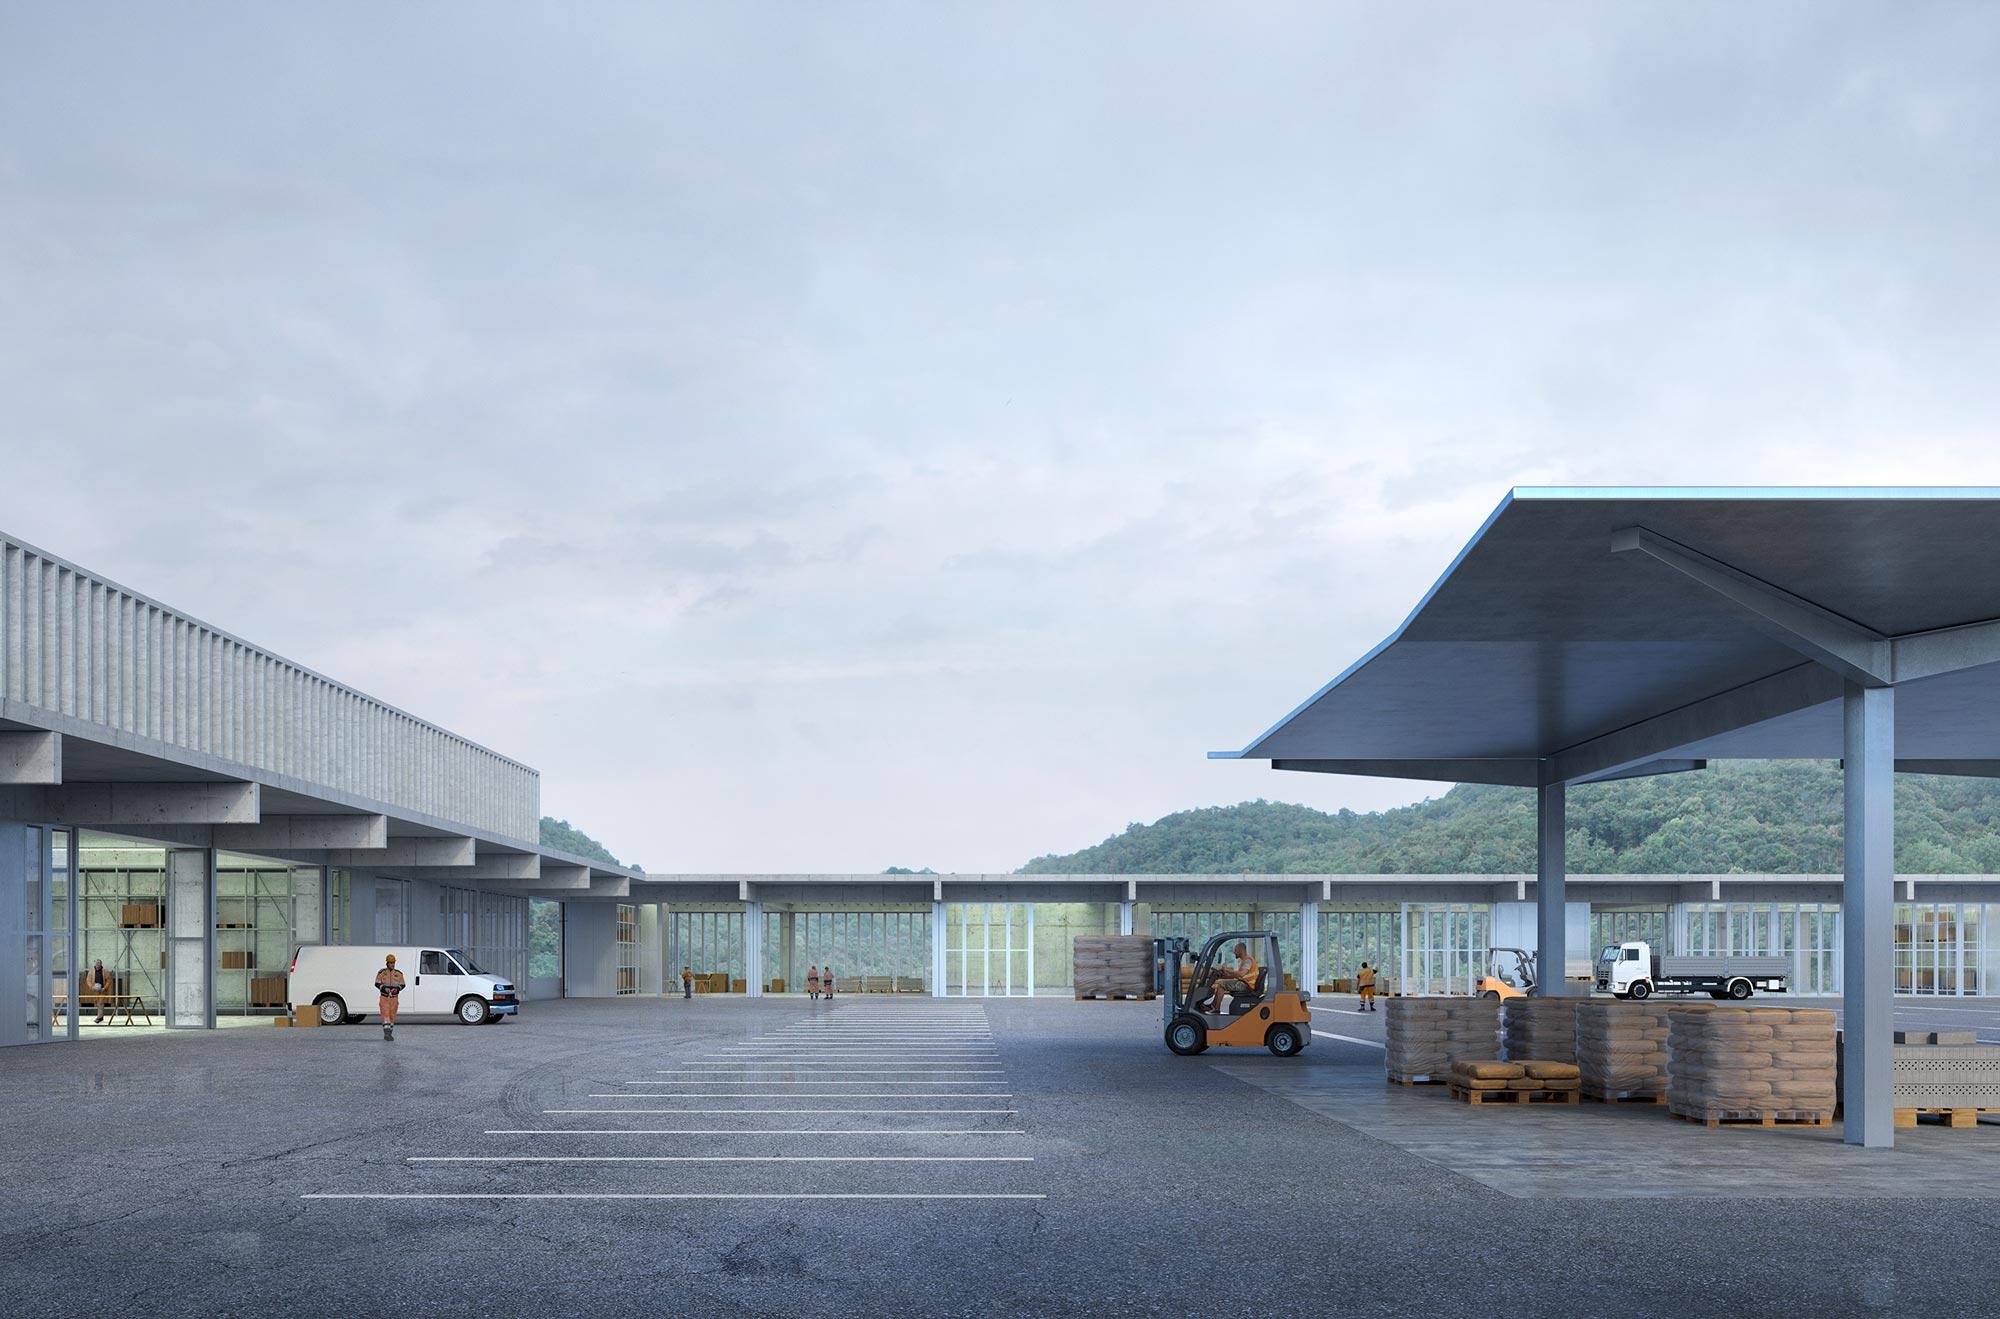 3rd Prize | Orsi & Associati + Montemurro Aguiar Architetti | DSU Headquarter, Lugano (CH)